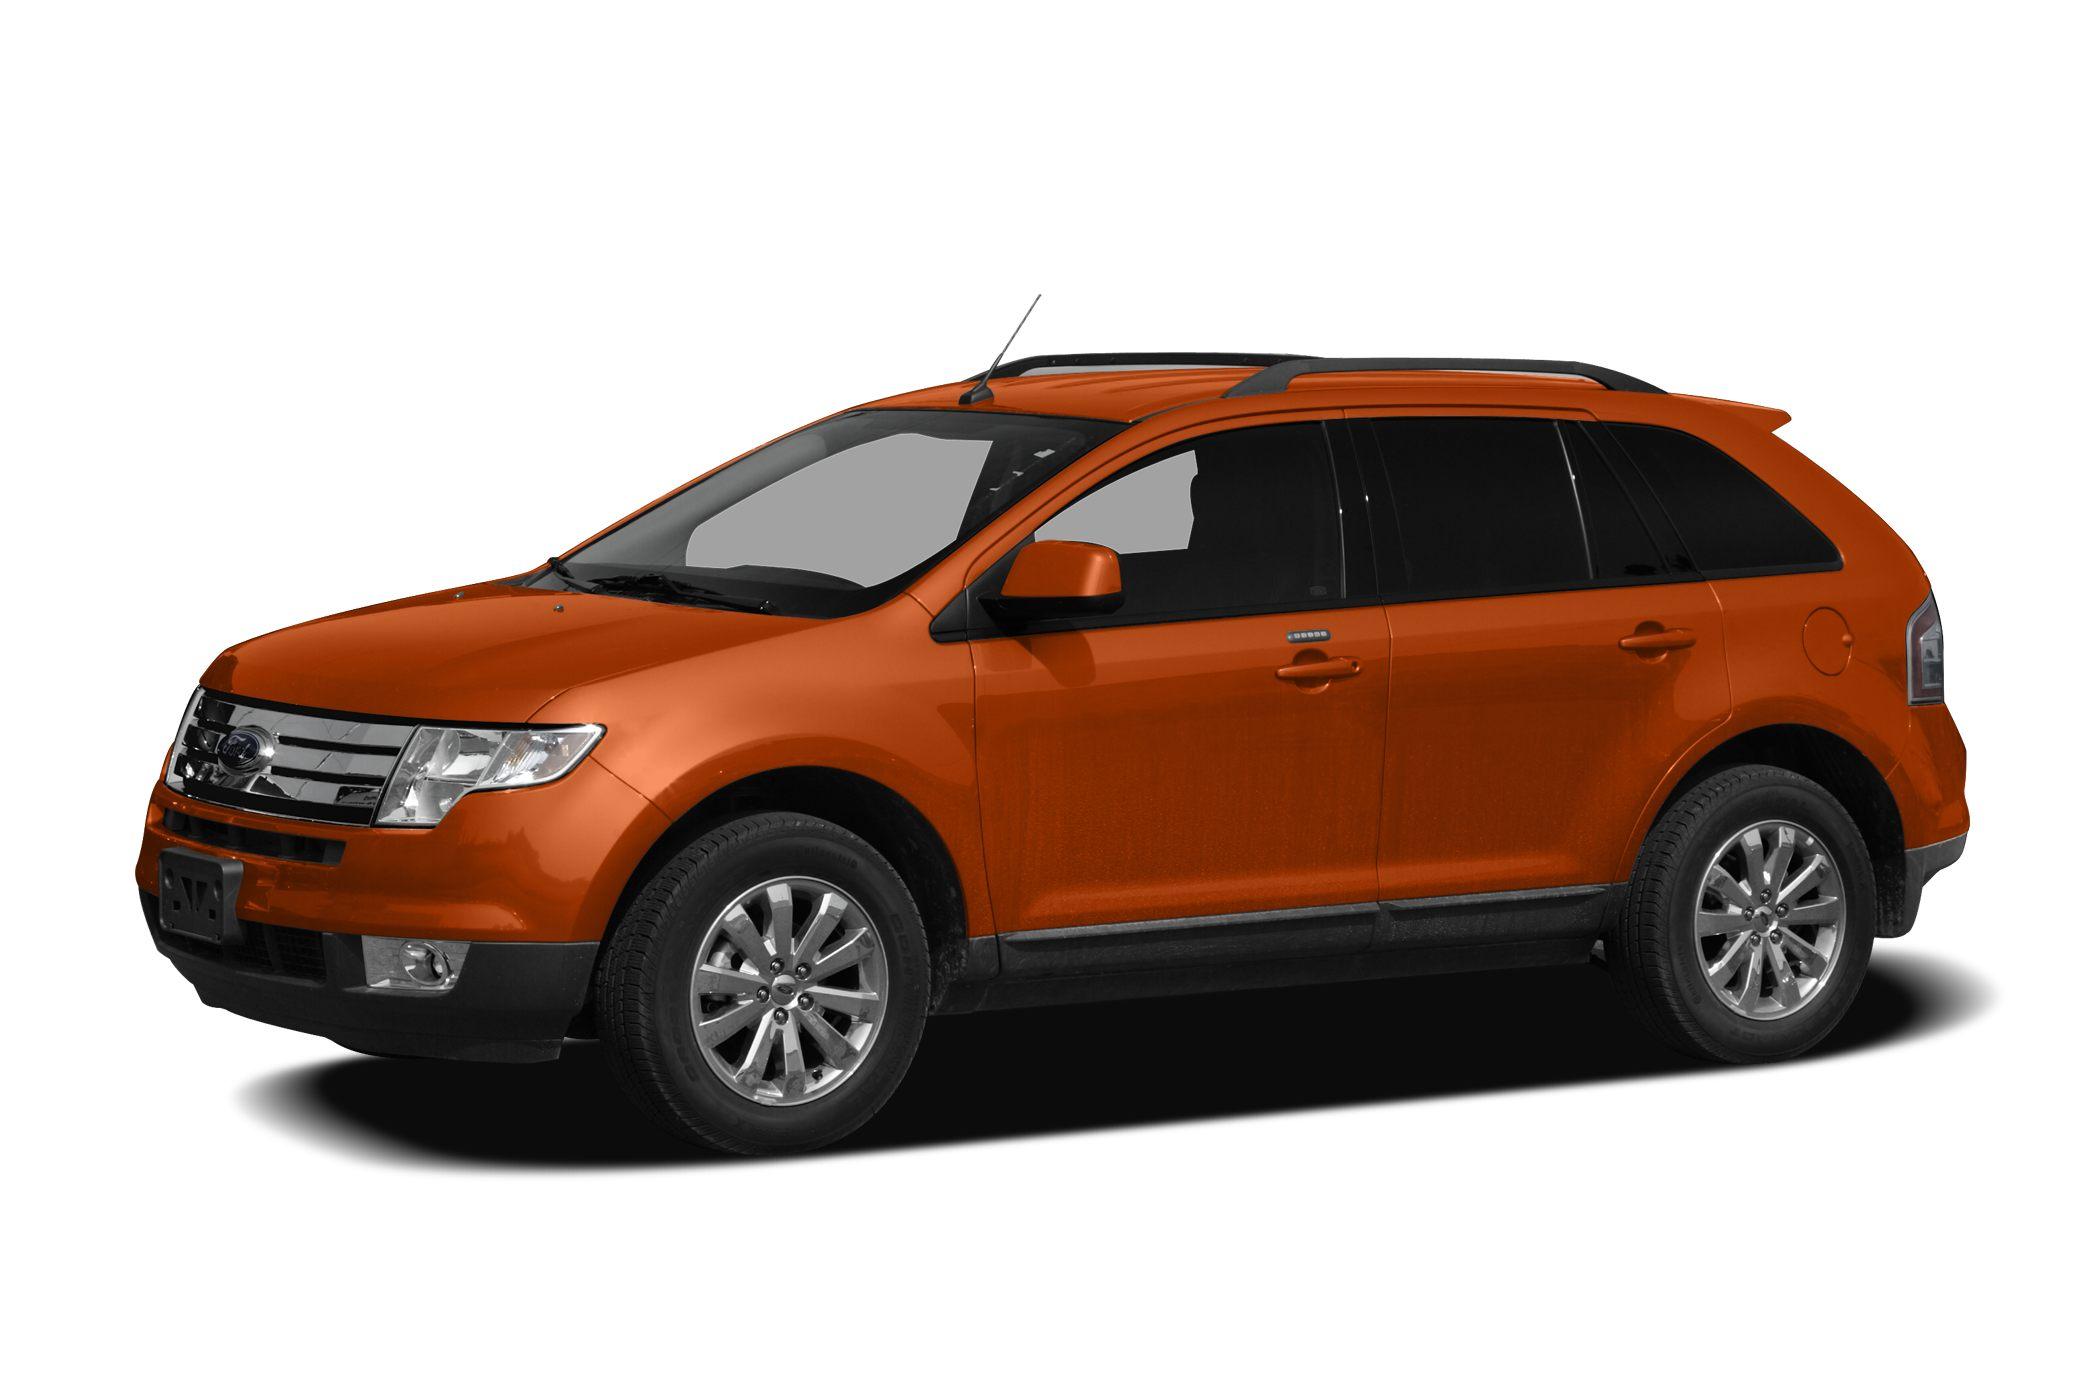 2008 Ford Edge Limited Clean CARFAX AWD 18 Premium Chrome-Clad Aluminum Wheels Heated front sea